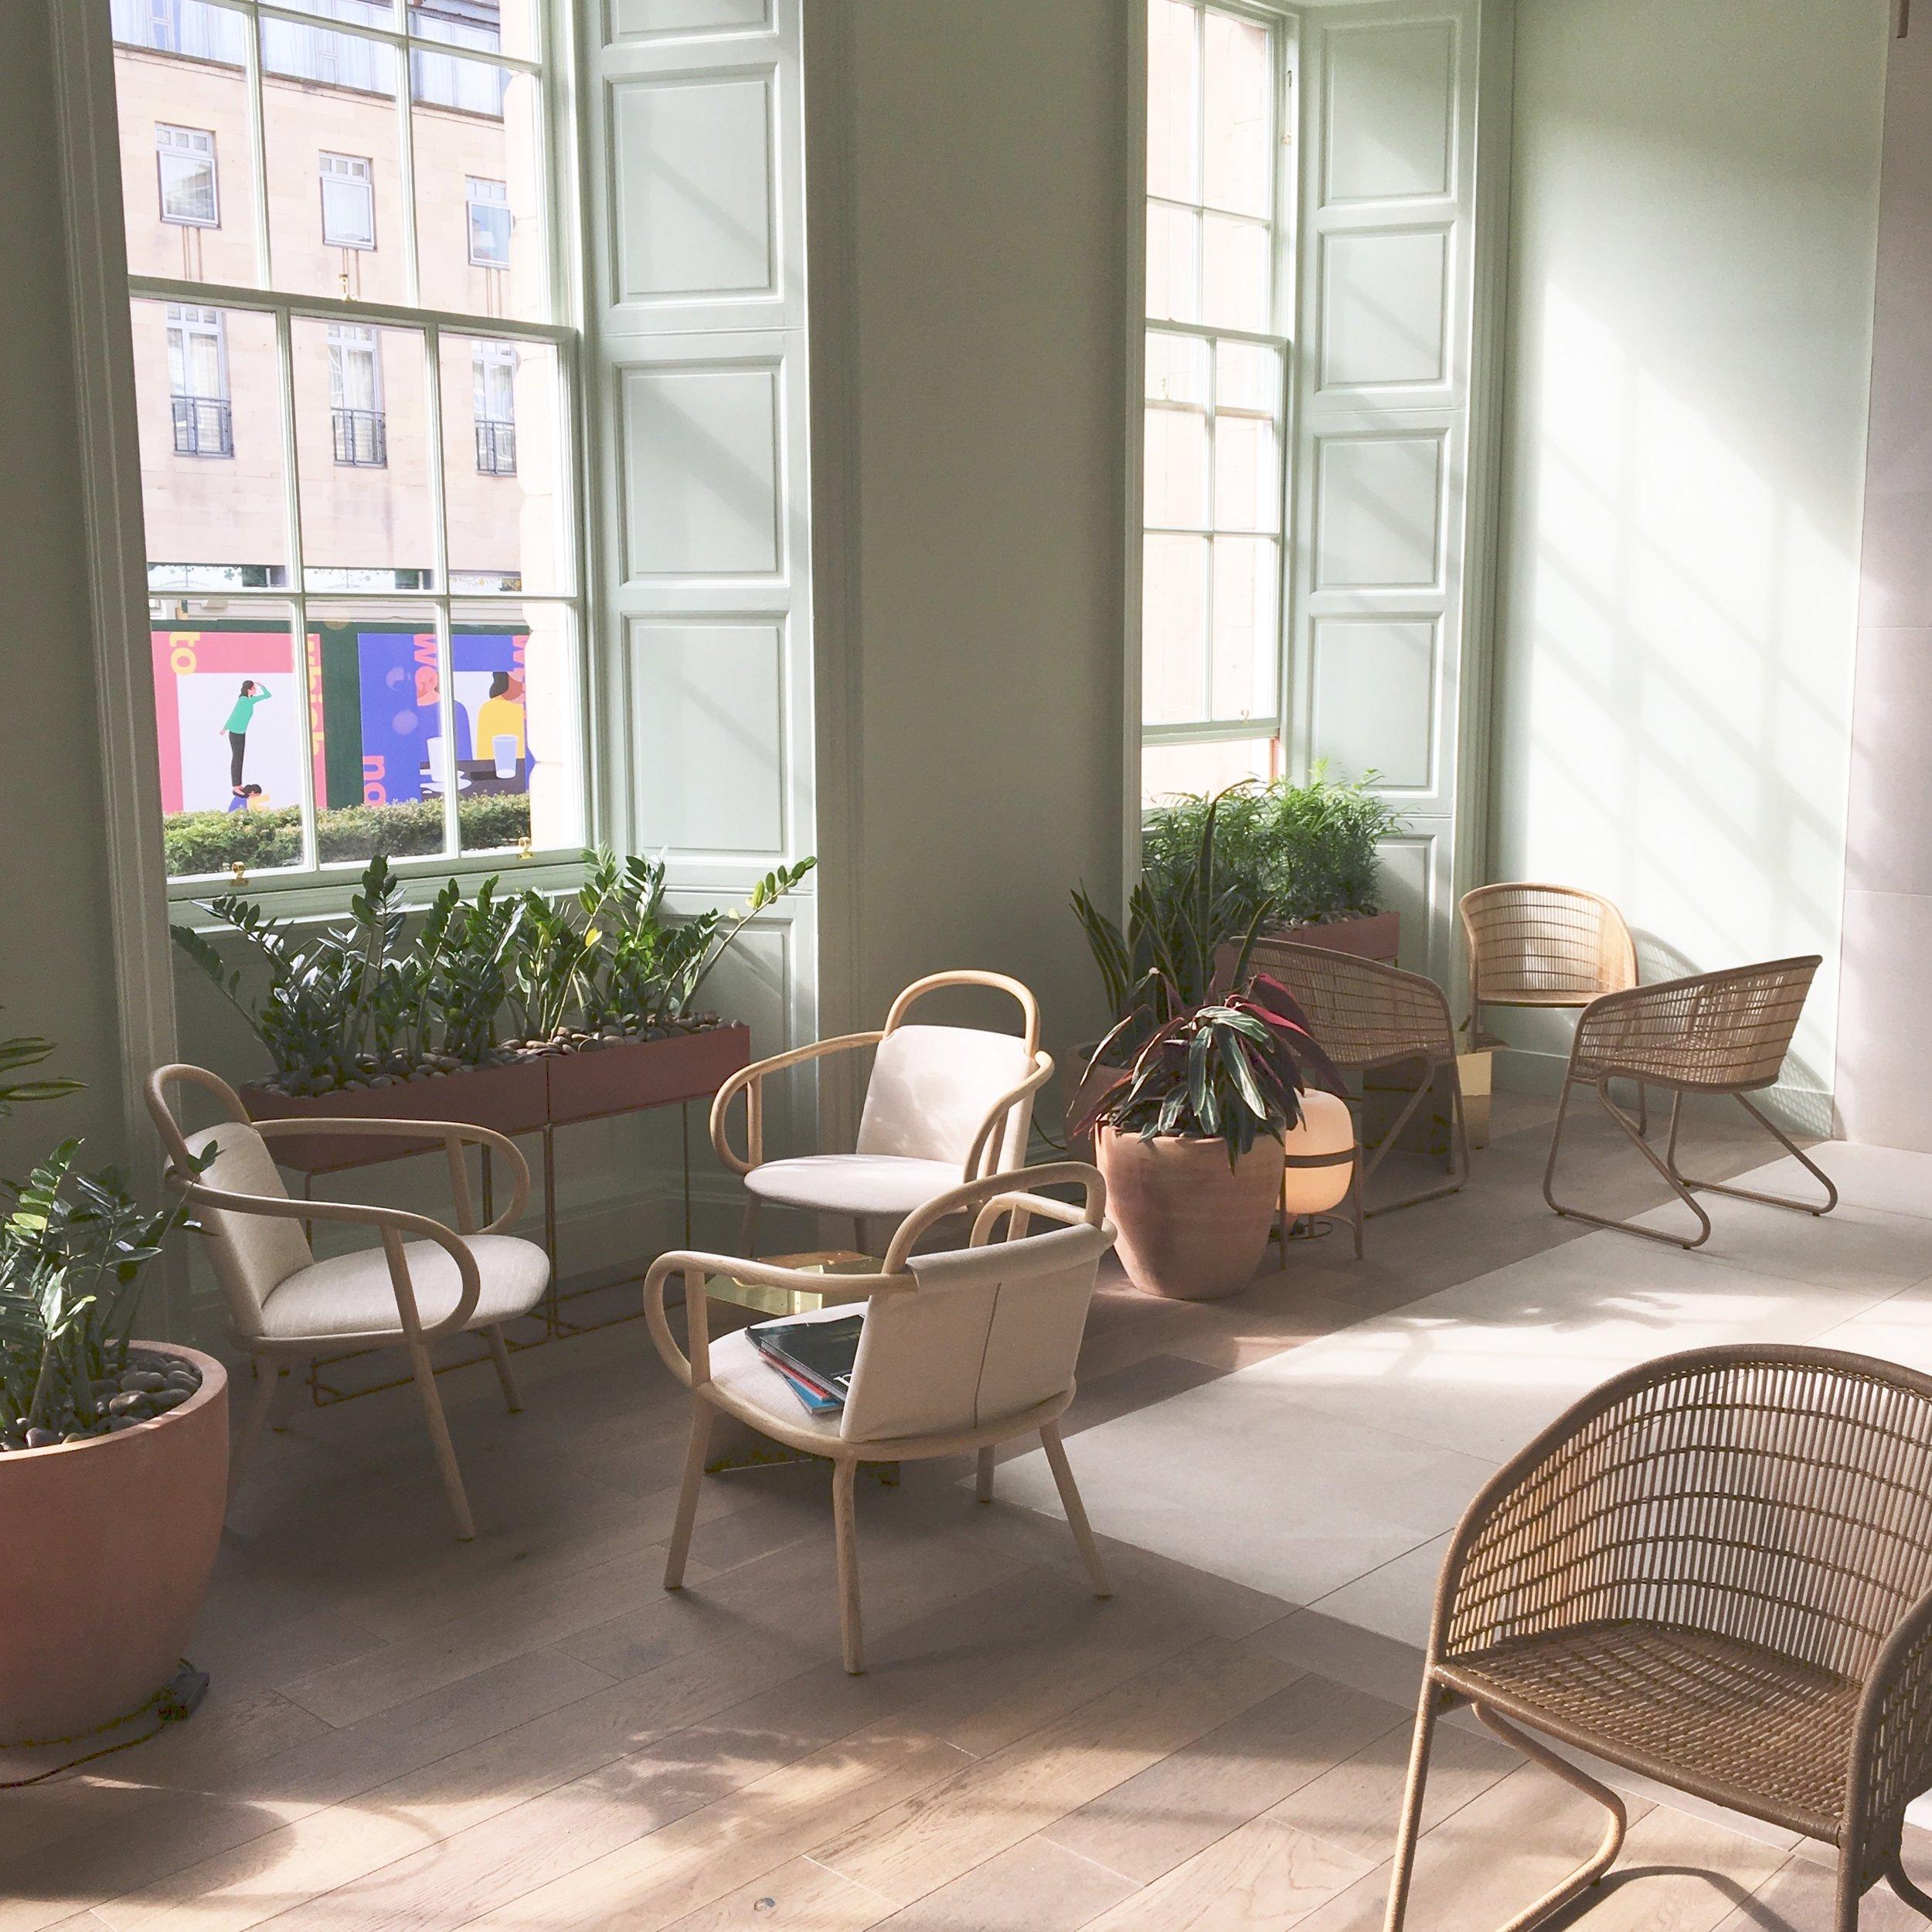 Eden Locke - lobby / cafe / bar area